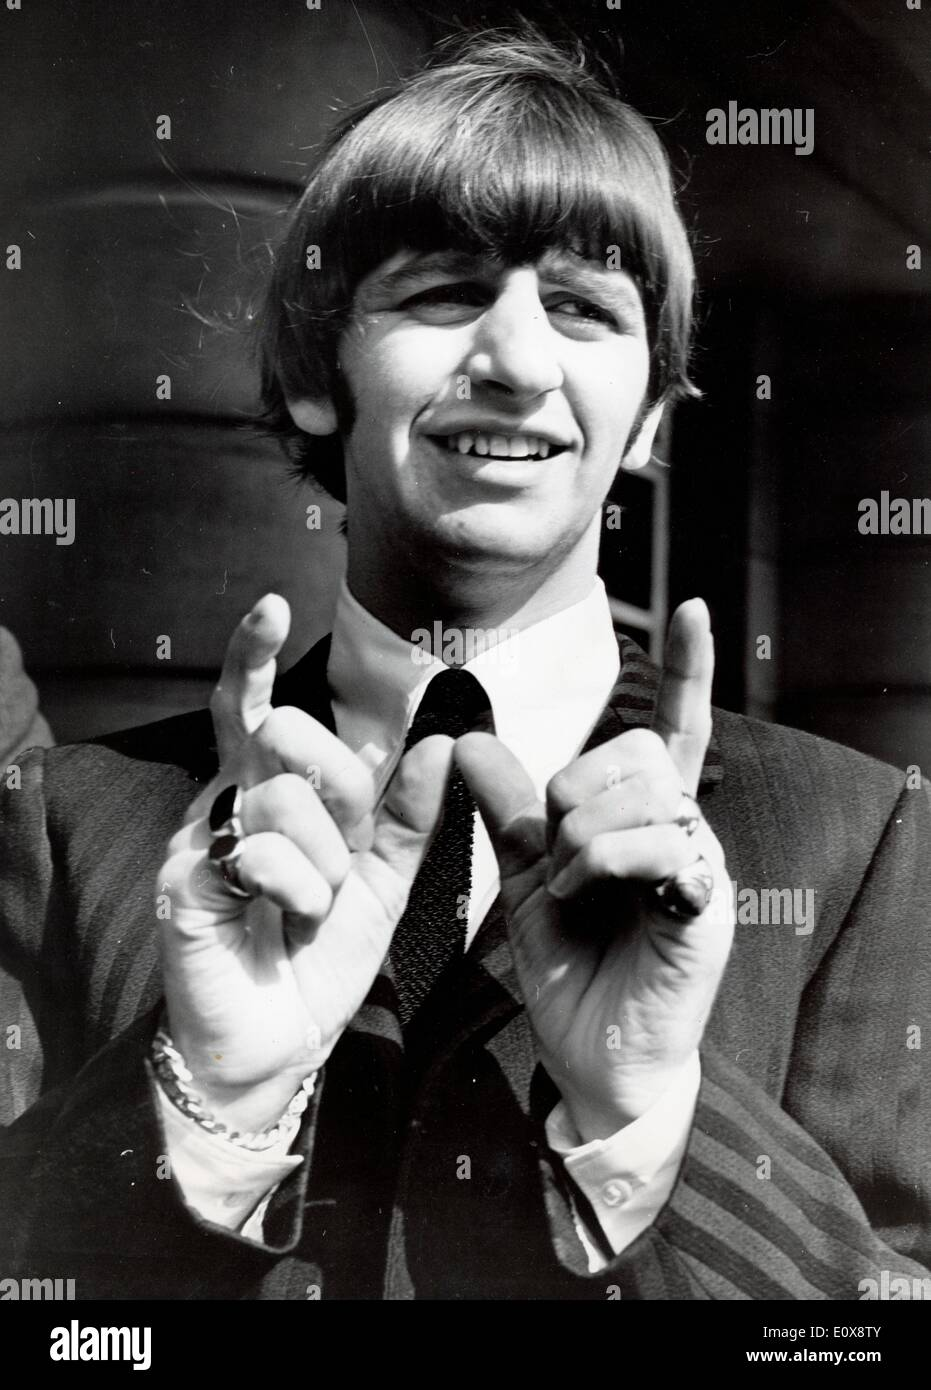 The Beatles Ringo Starr jokes about newborn son - Stock Image